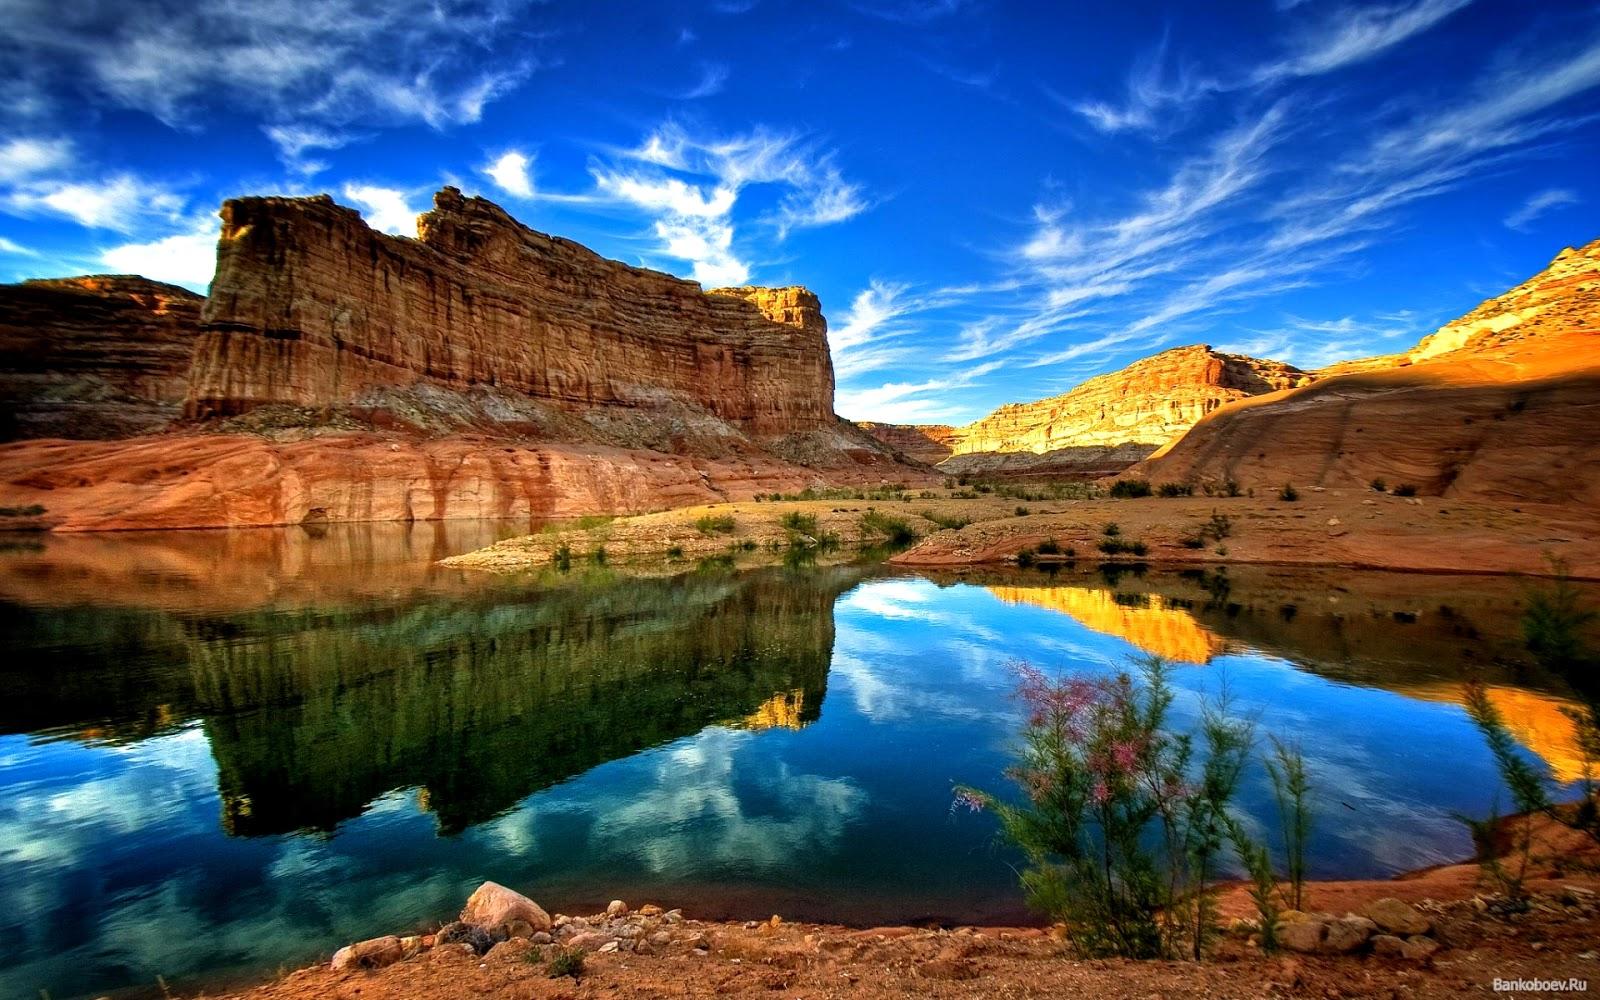 Fond d 39 cran paysage fond d 39 cran hd for Fonds ecran paysages superbes